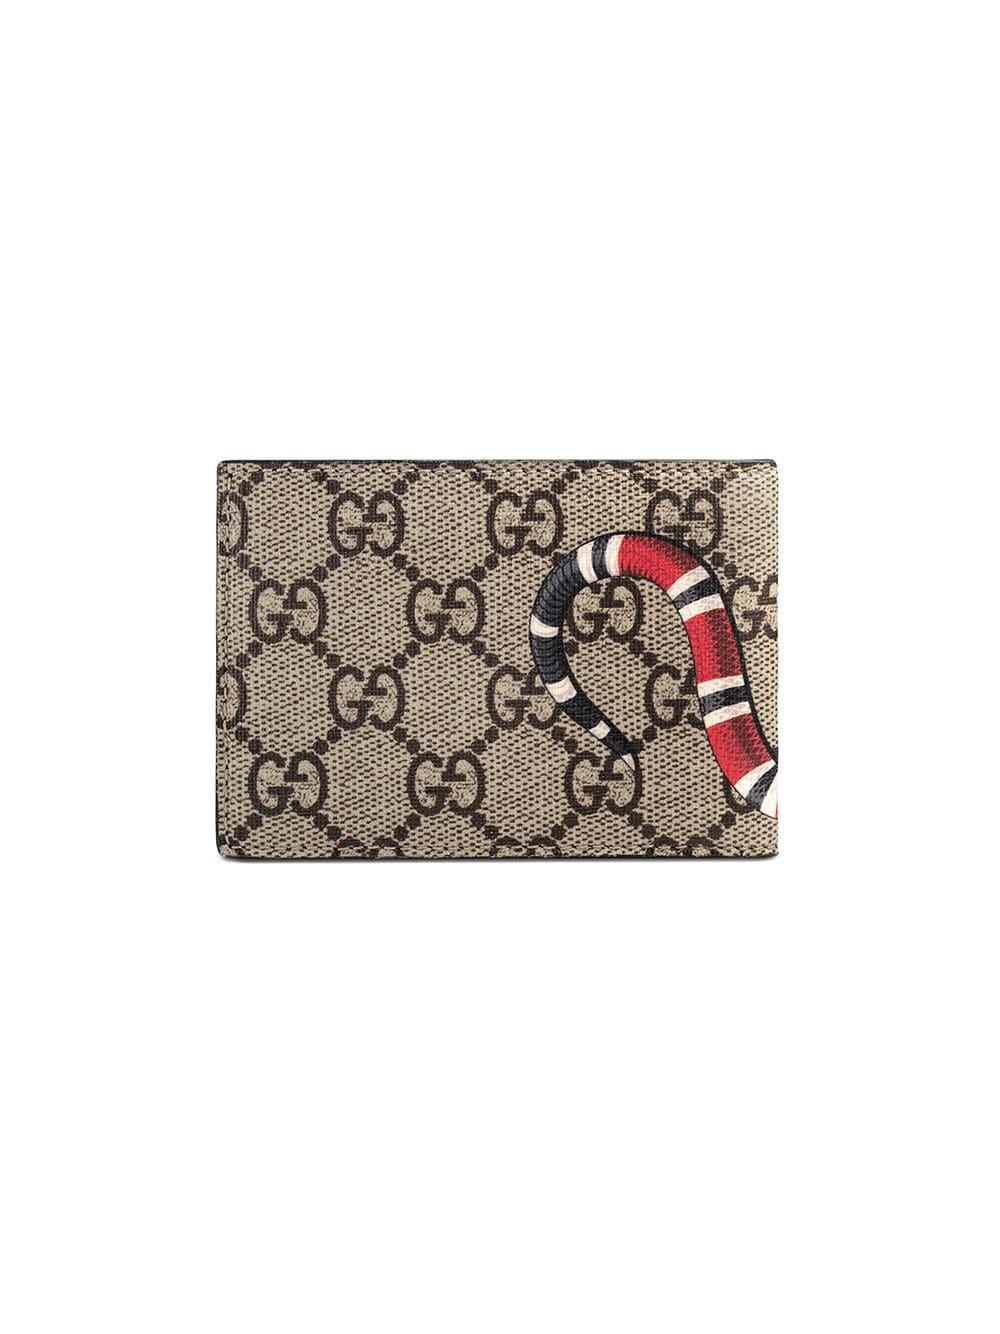 6b4b4ee1574 Gucci - Multicolor Kingsnake Print GG Supreme Wallet for Men - Lyst. View  fullscreen